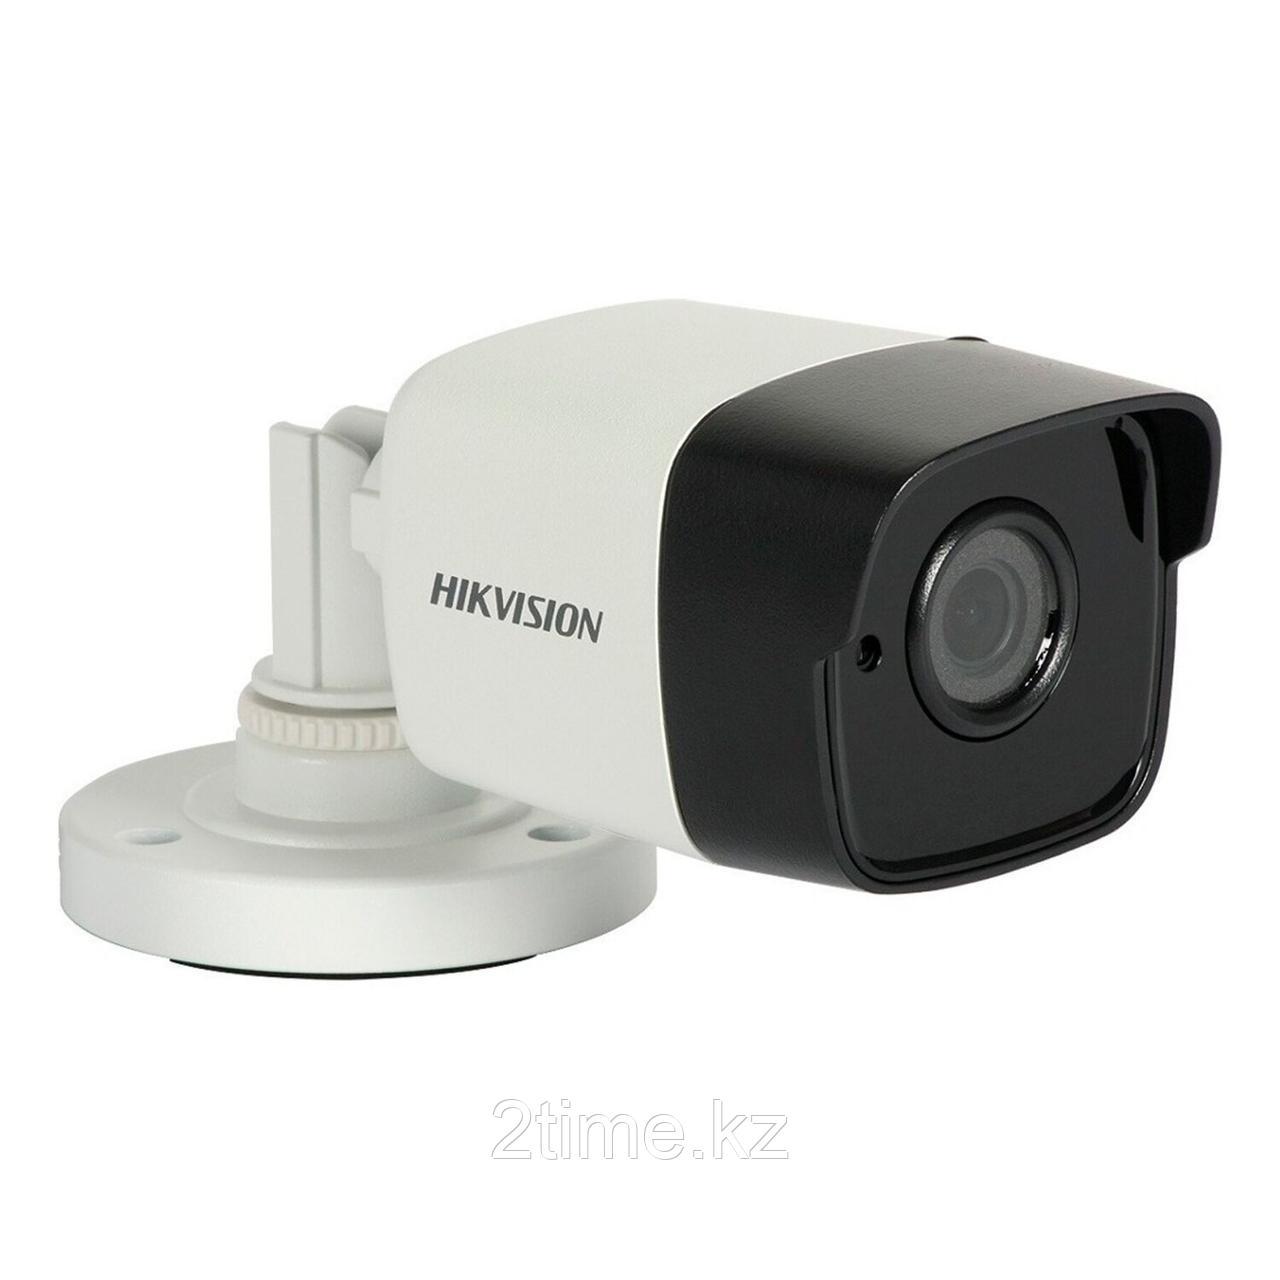 Hikvision DS-2CE16D8T-ITF (2.8 мм) 2Мп уличная видеокамера